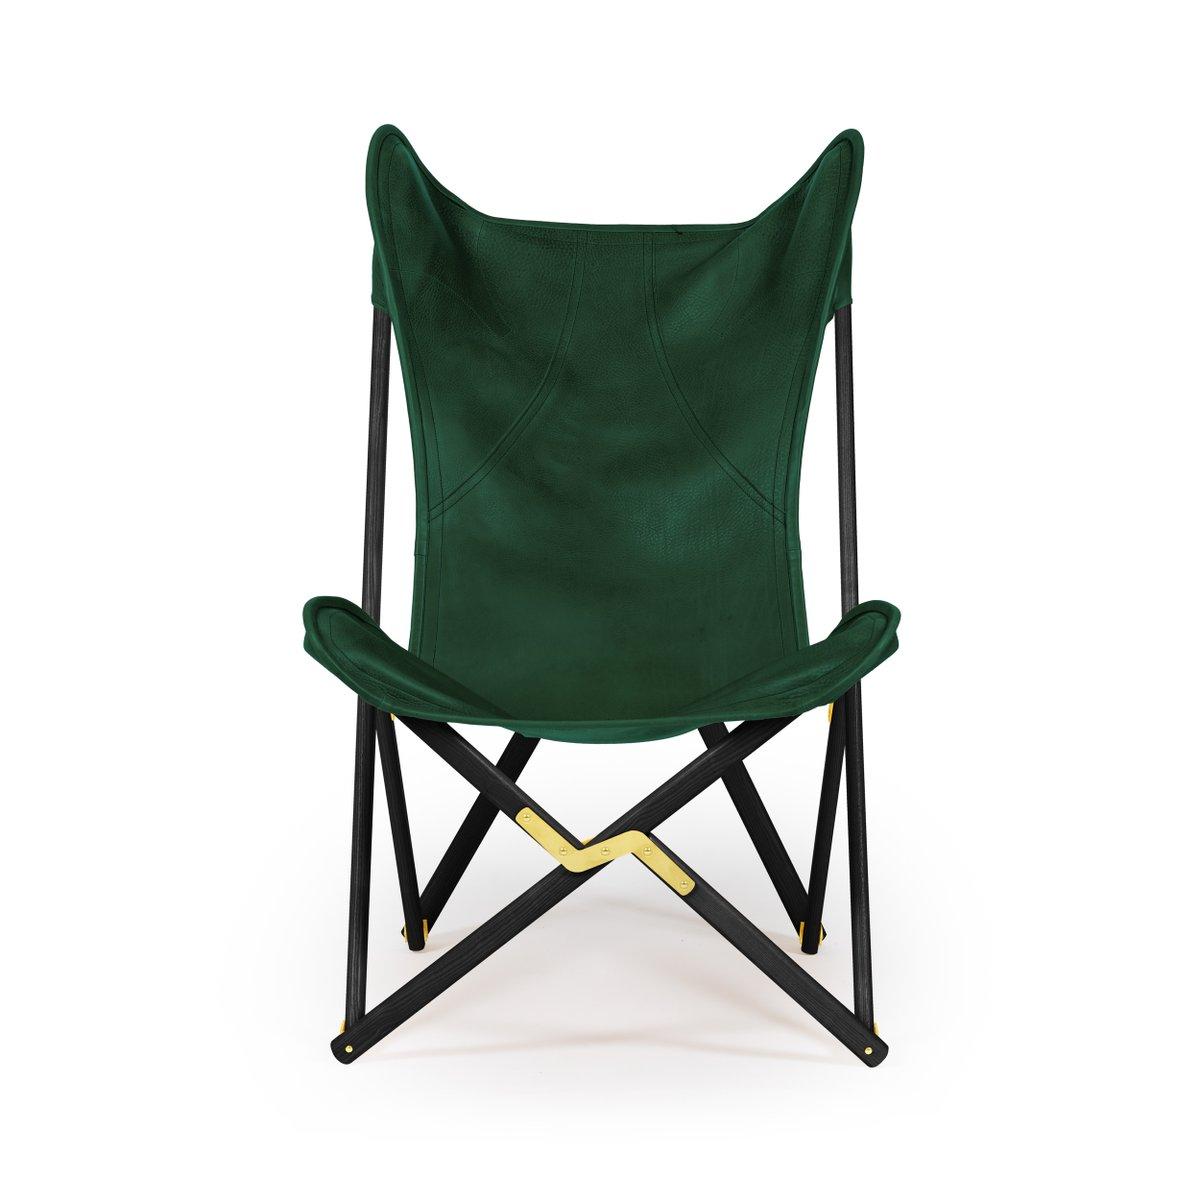 gr ner leder telami tripolina stuhl von telami bei pamono kaufen. Black Bedroom Furniture Sets. Home Design Ideas